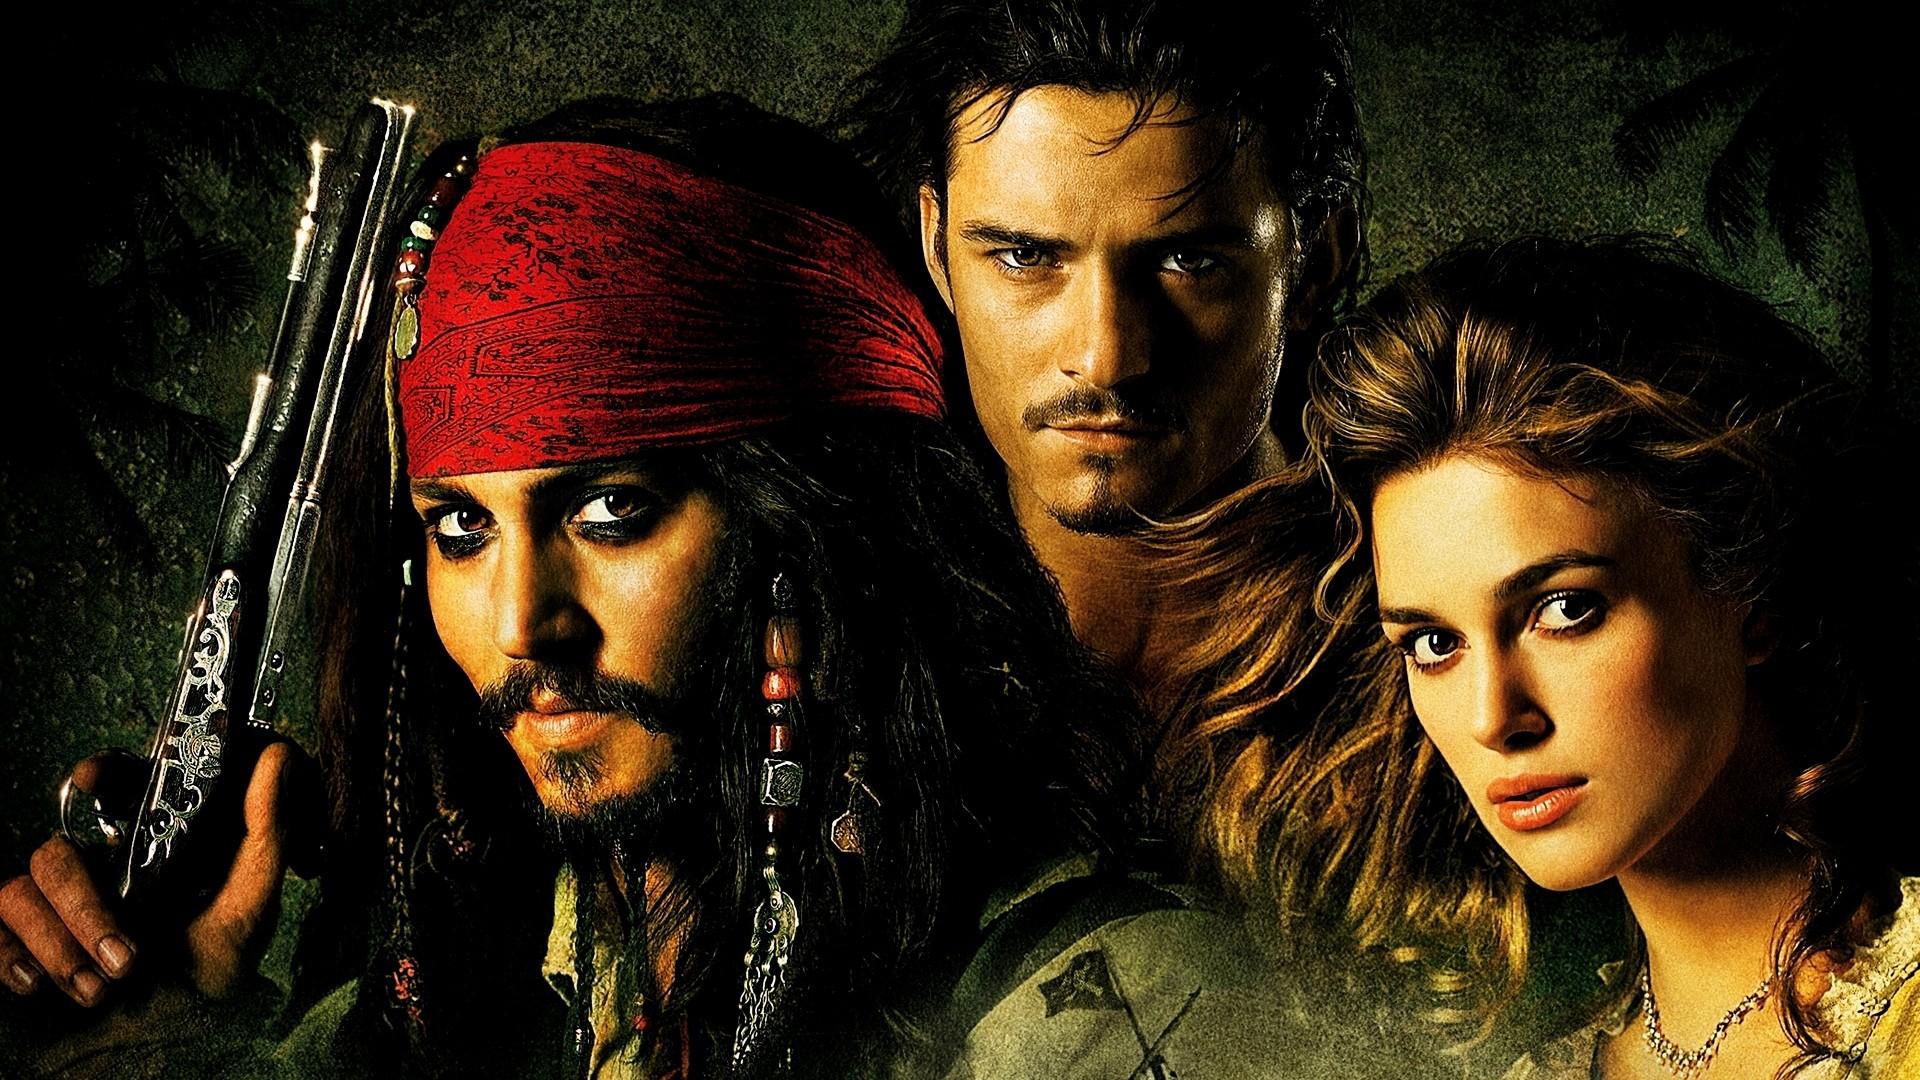 Blackbeard's Ship in Pirates Of The Caribbean 4 HD Wallpaper | Pirates of  the Caribbean | Pinterest | Wallpaper and Hd wallpaper